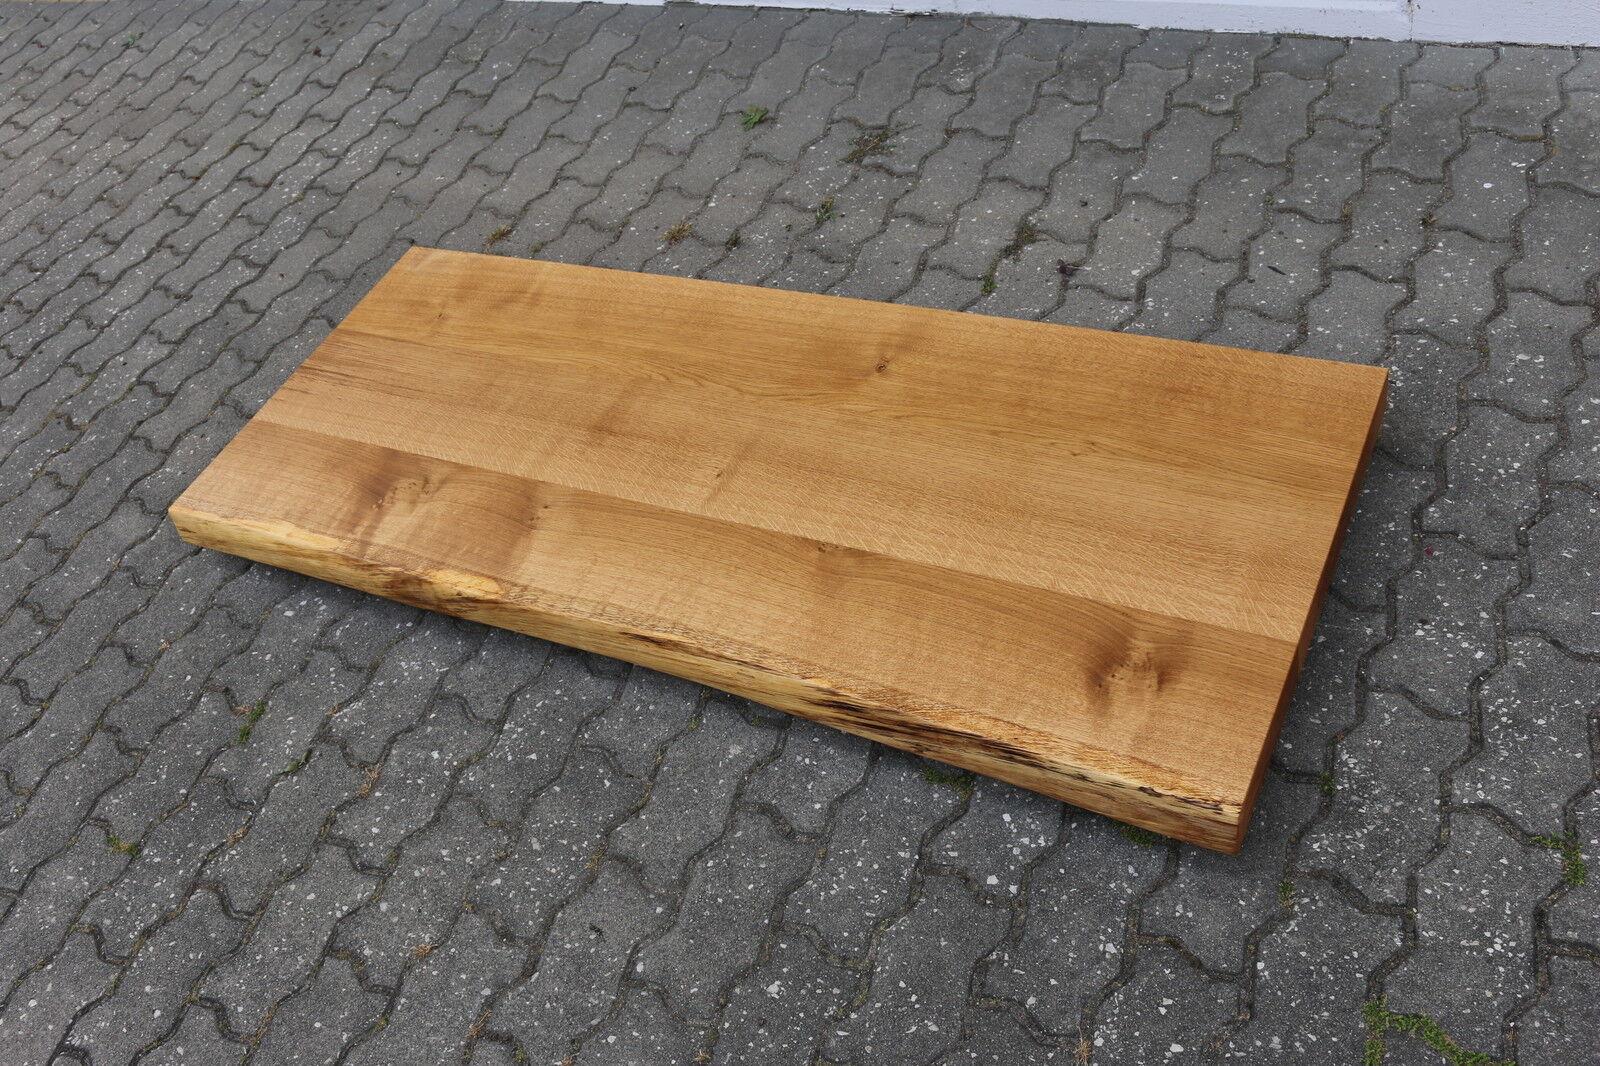 tischplatte platte eiche massiv holz tisch brett leimholz 6cm stark m baumkante eur 420 00. Black Bedroom Furniture Sets. Home Design Ideas